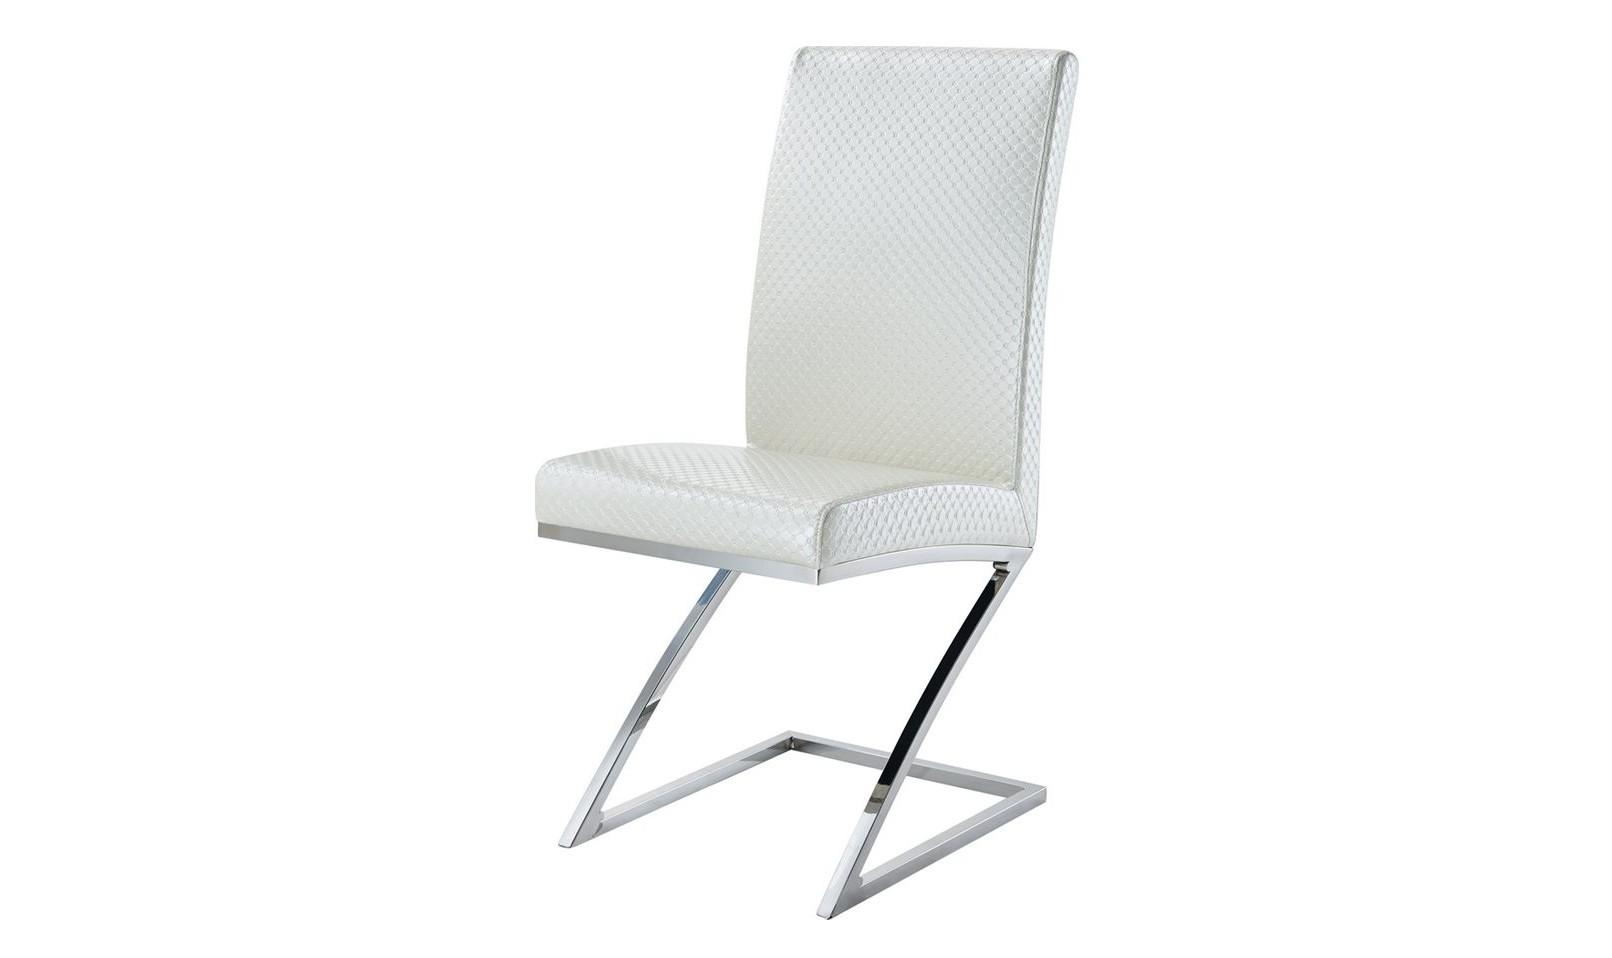 СтулОбеденные стулья<br><br><br>Material: Кожа<br>Width см: 43<br>Depth см: 36<br>Height см: 96